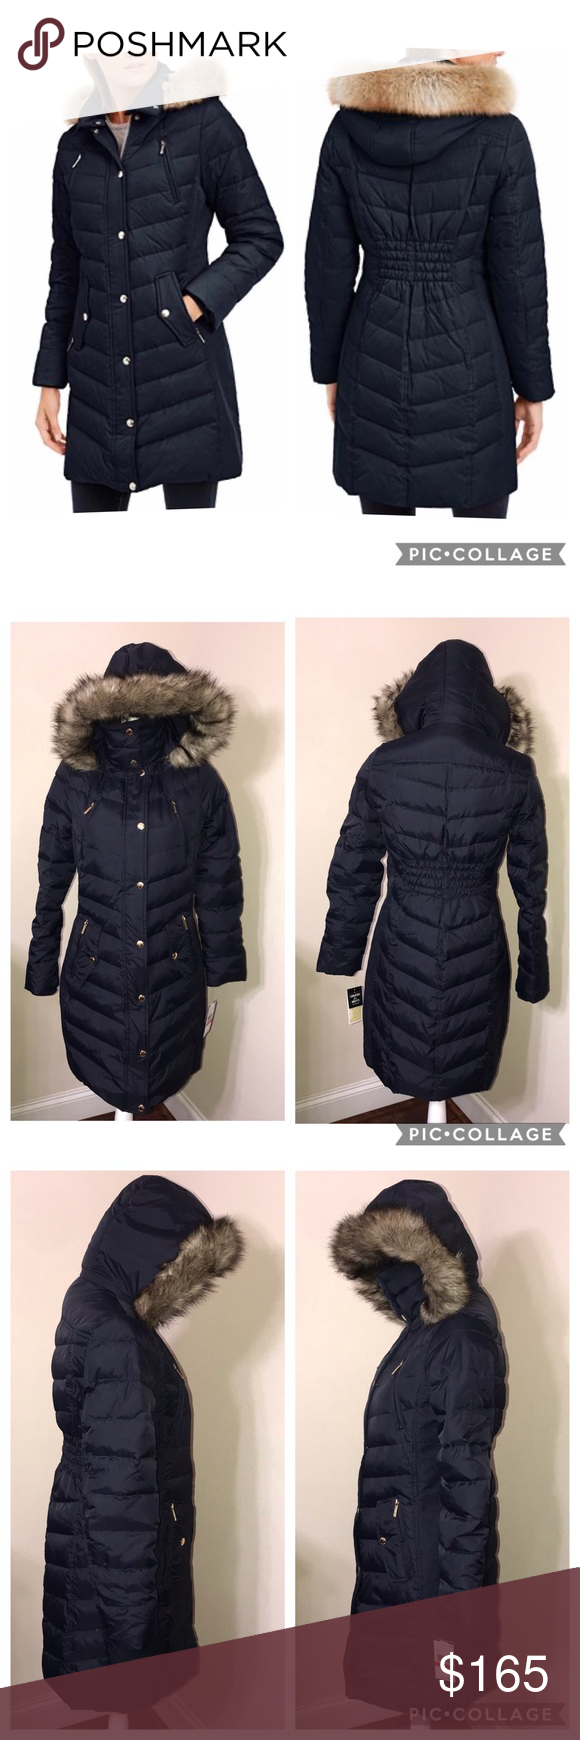 Michael Kors Faux Fur Trim Hooded Down Puffer Coat Down Puffer Coat Puffer Coat Michael Kors Jackets [ 1740 x 580 Pixel ]